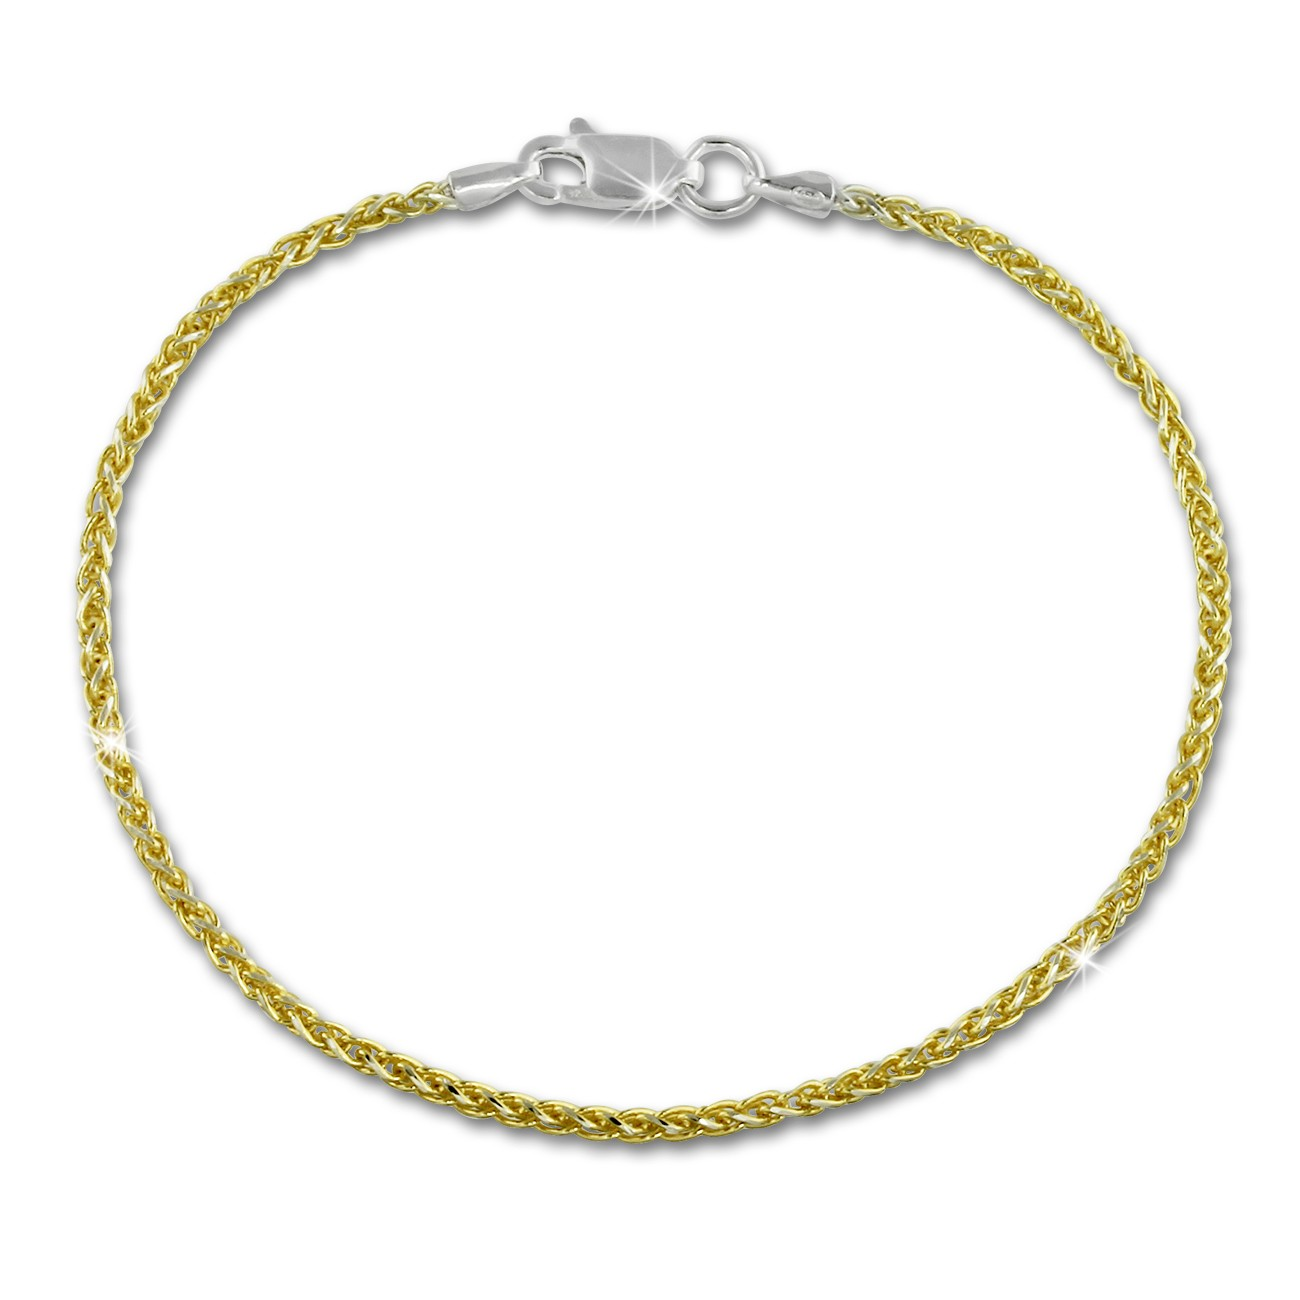 SilberDream Armband Zopf vergoldet 925er Silber Damen 19cm SDA2069Y